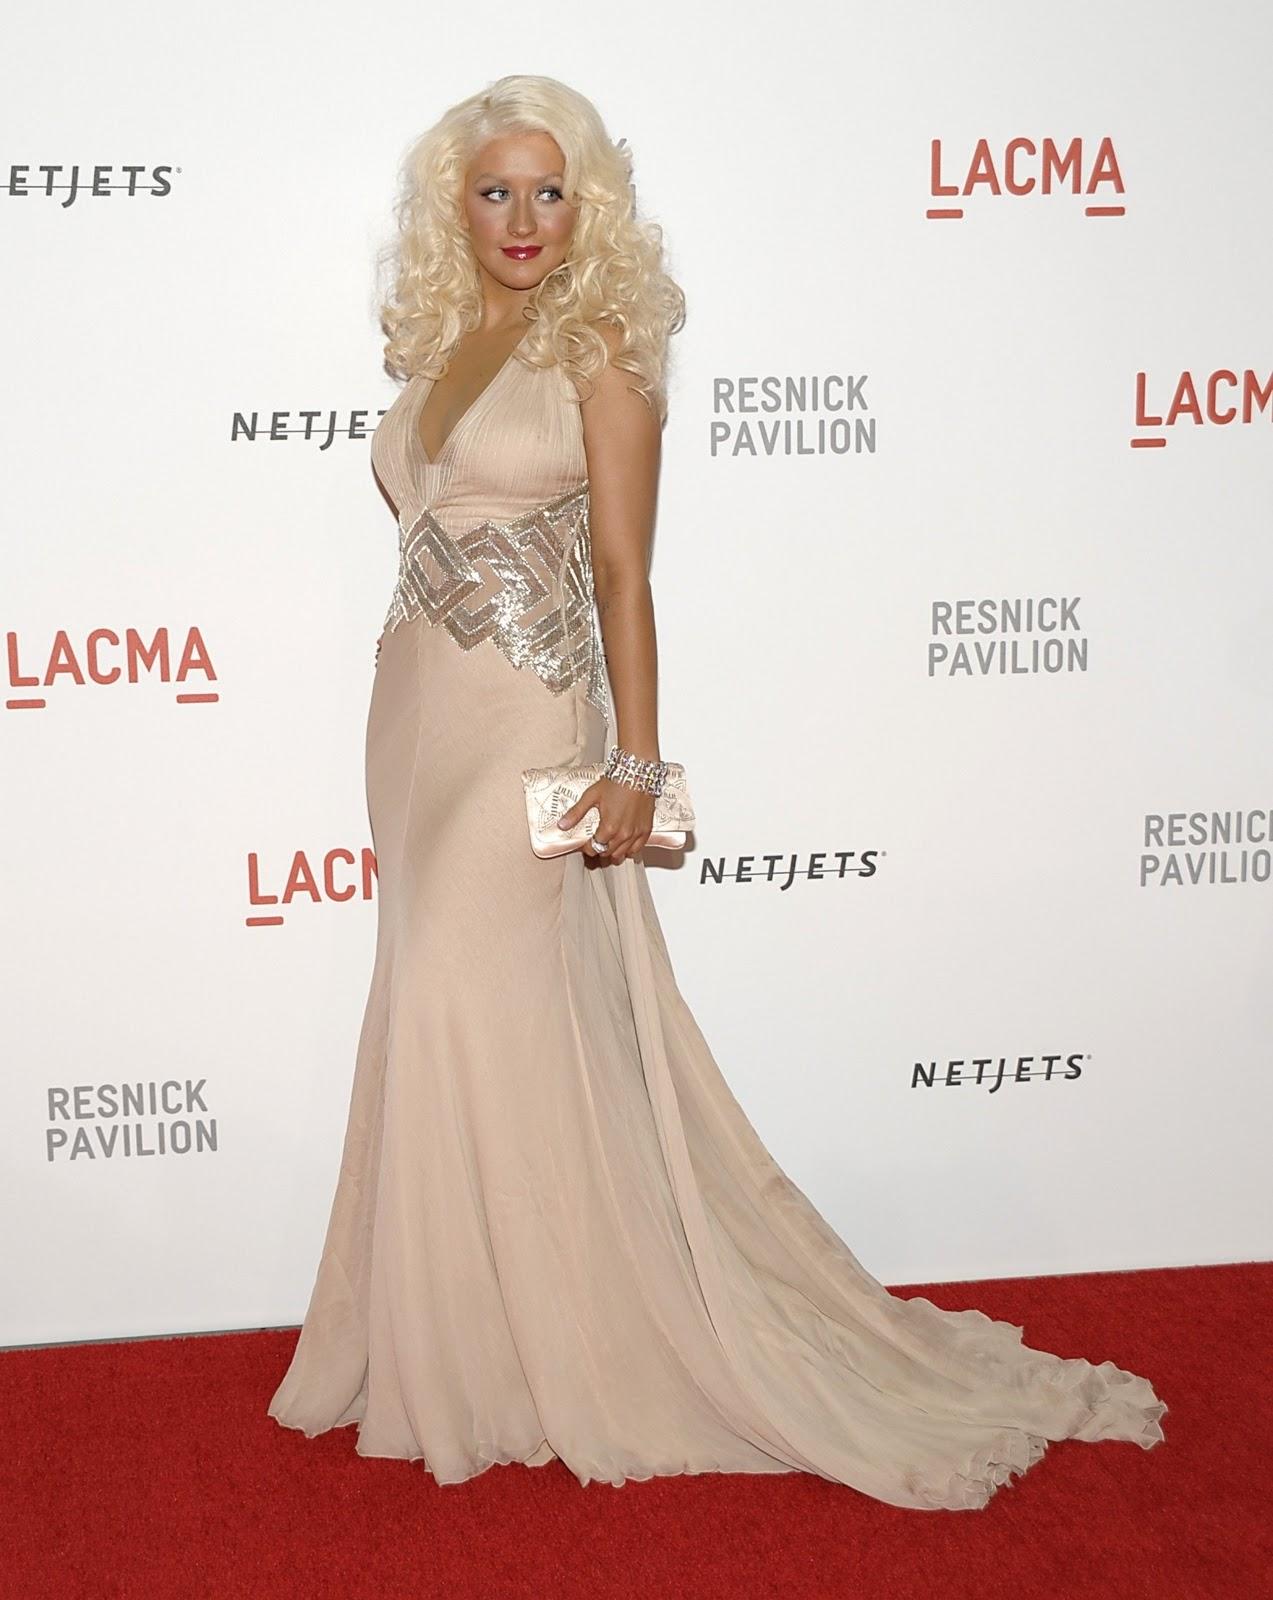 http://2.bp.blogspot.com/_DqQNorl_2Kc/TJ9DH69IXjI/AAAAAAAAAHY/VV8KK8G-cTM/s1600/Christina-Aguilera-11.jpg